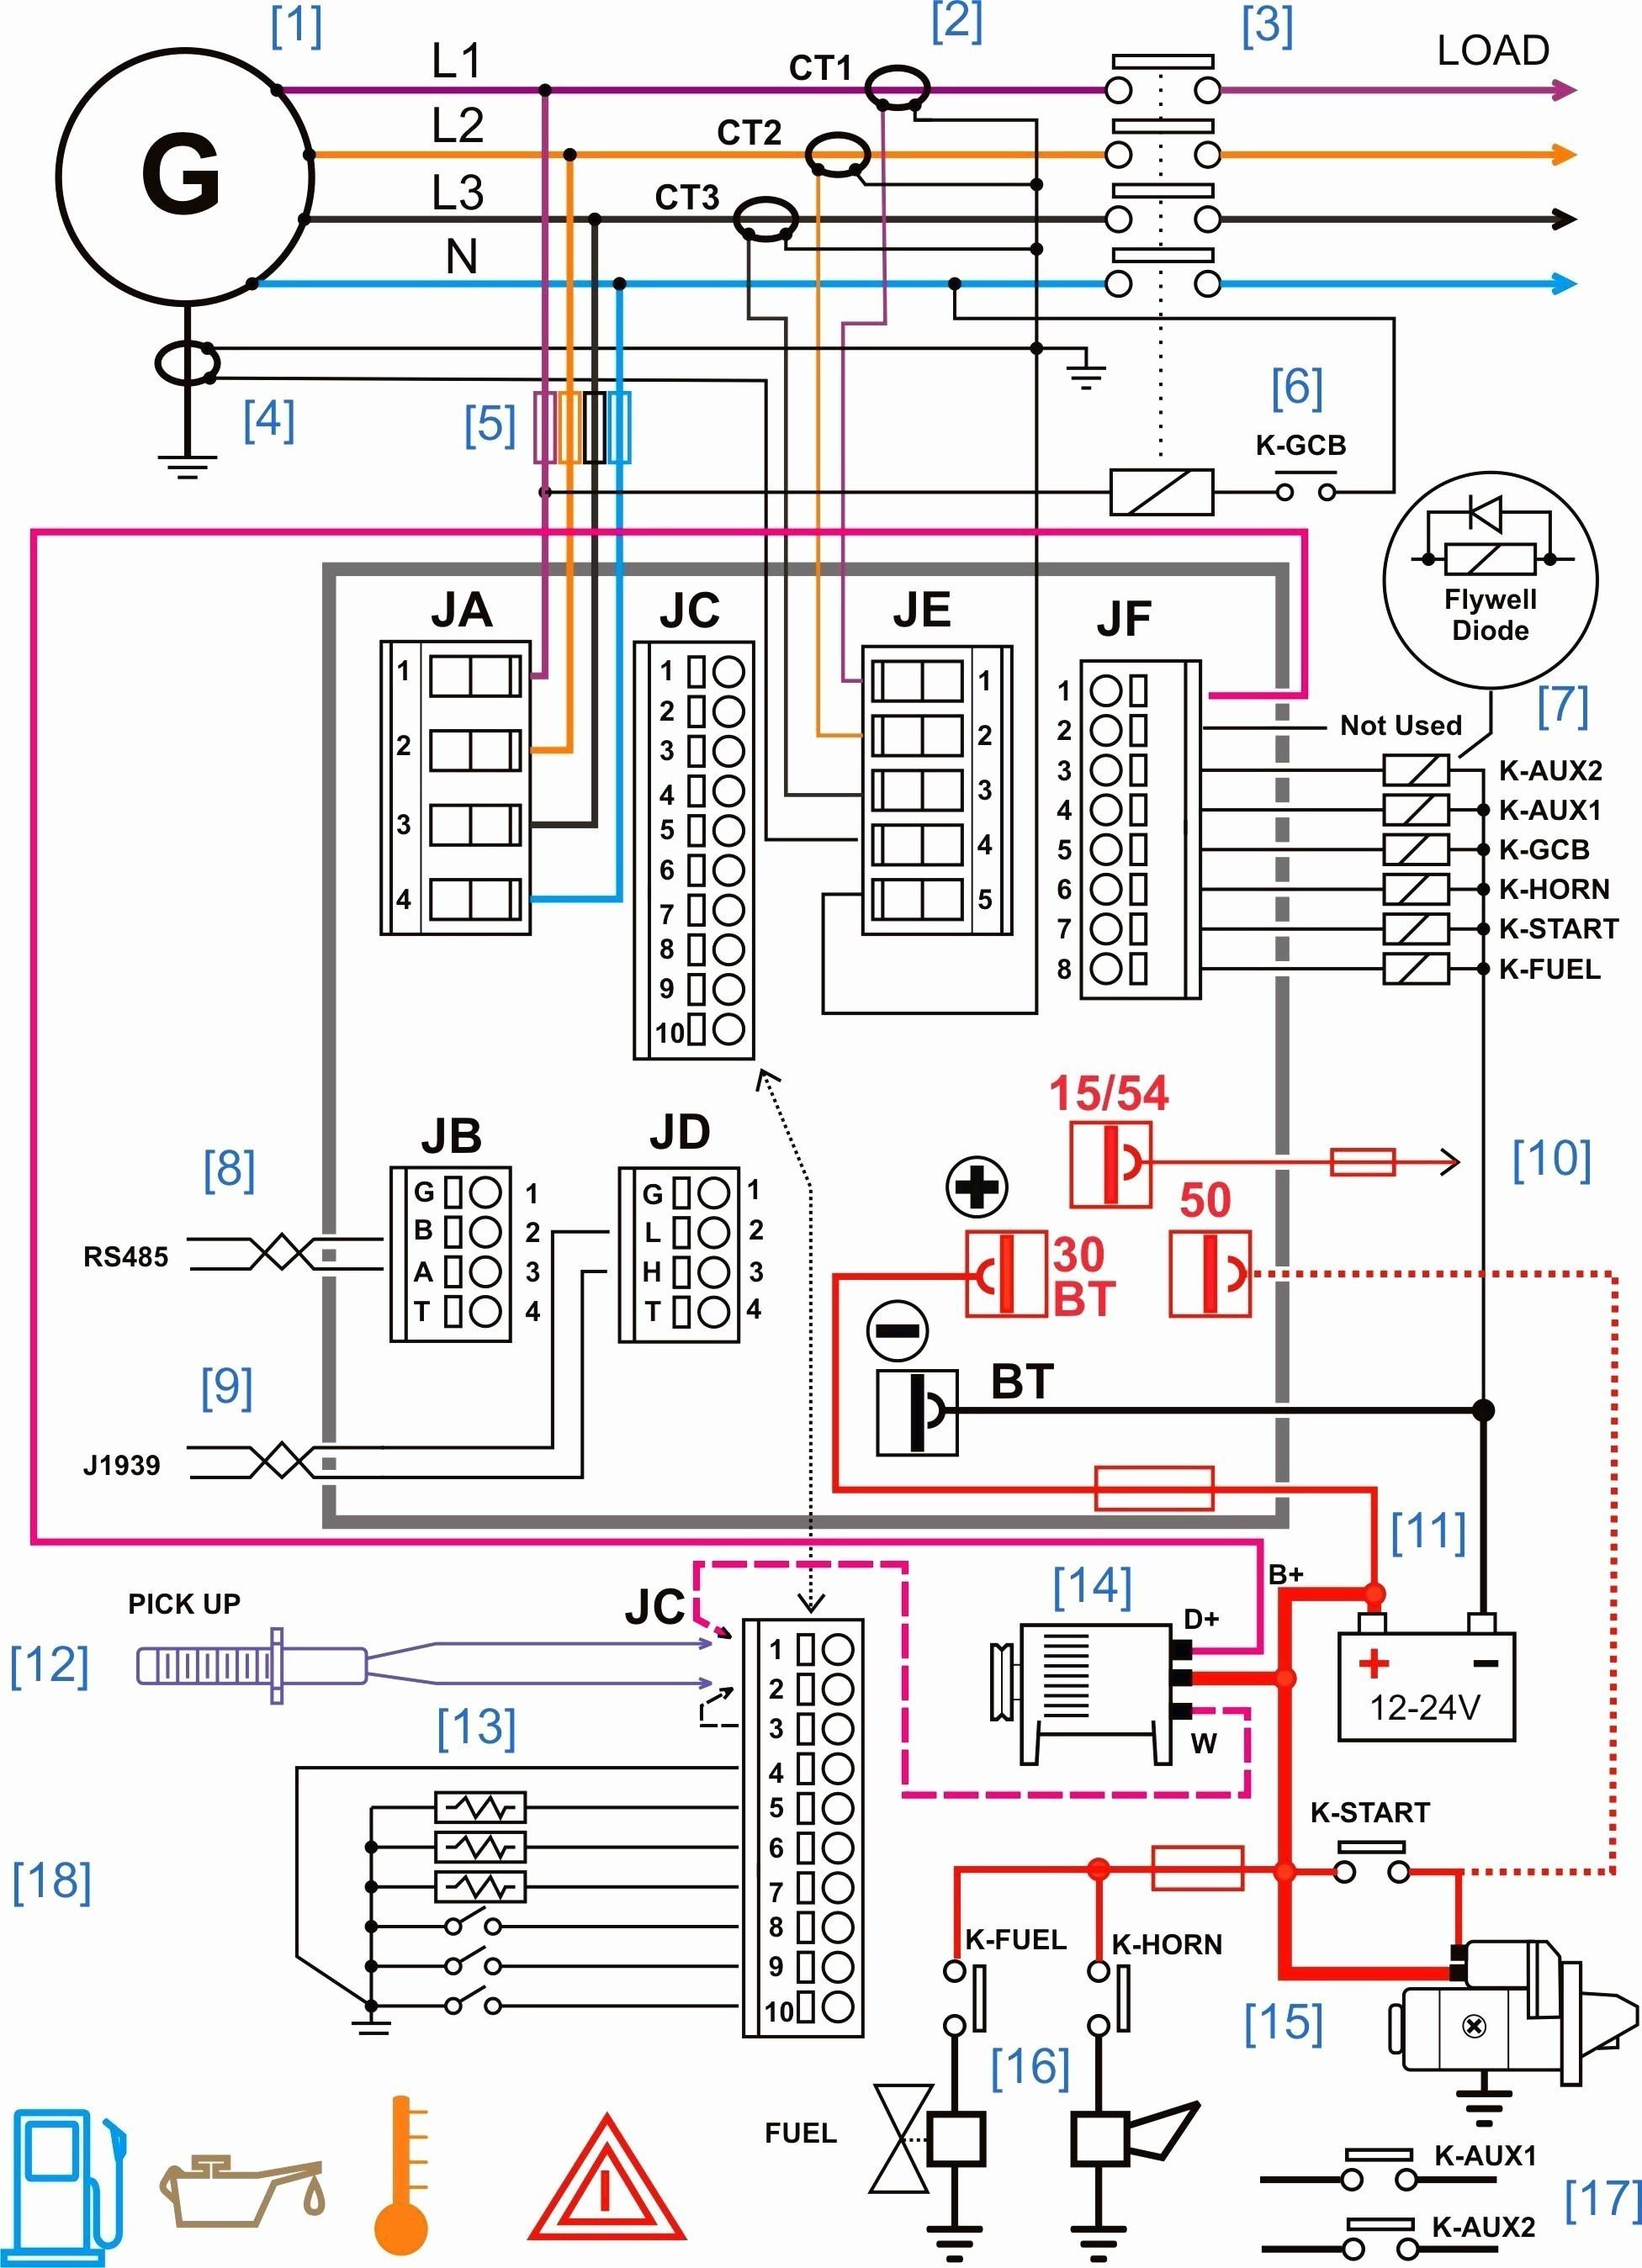 Car Speaker Wiring Diagram Save Audi A4 Cd Player Wiring Diagram Of Car Speaker Wiring Diagram